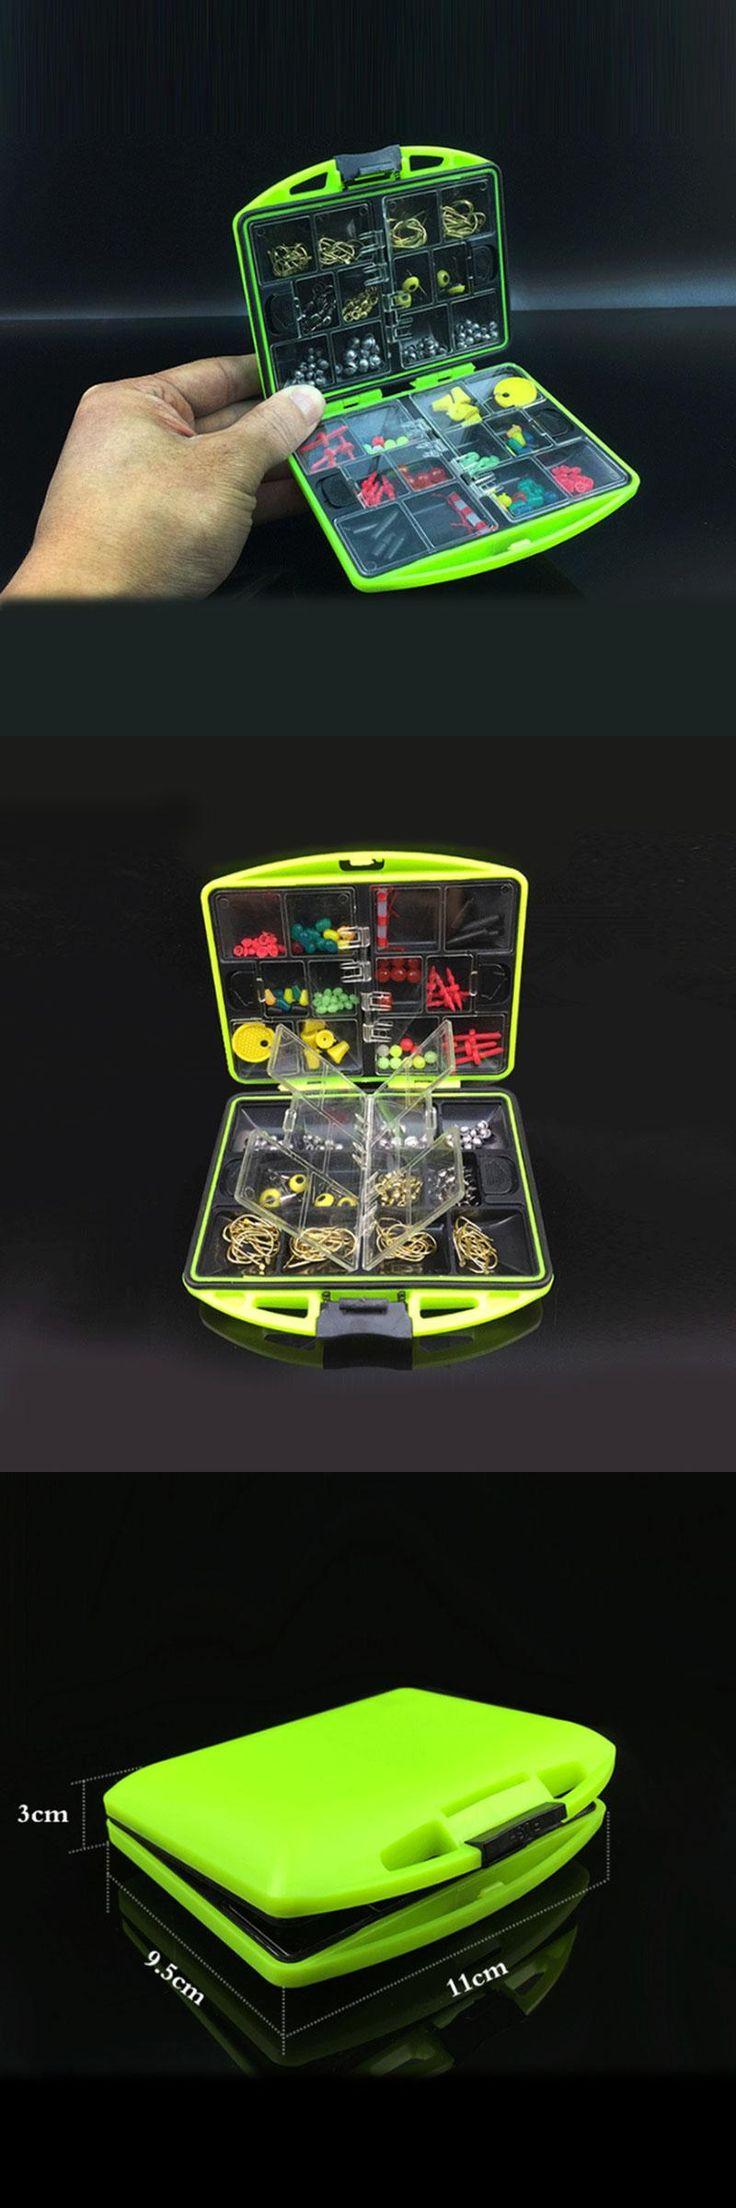 [Visit to Buy] 100 Pcs/Box Rock Fishing Accessories Box Surf Casting Fishing Tackle Box Swivel Jig Hooks Fishing Tools Set Fast Shipping #Advertisement